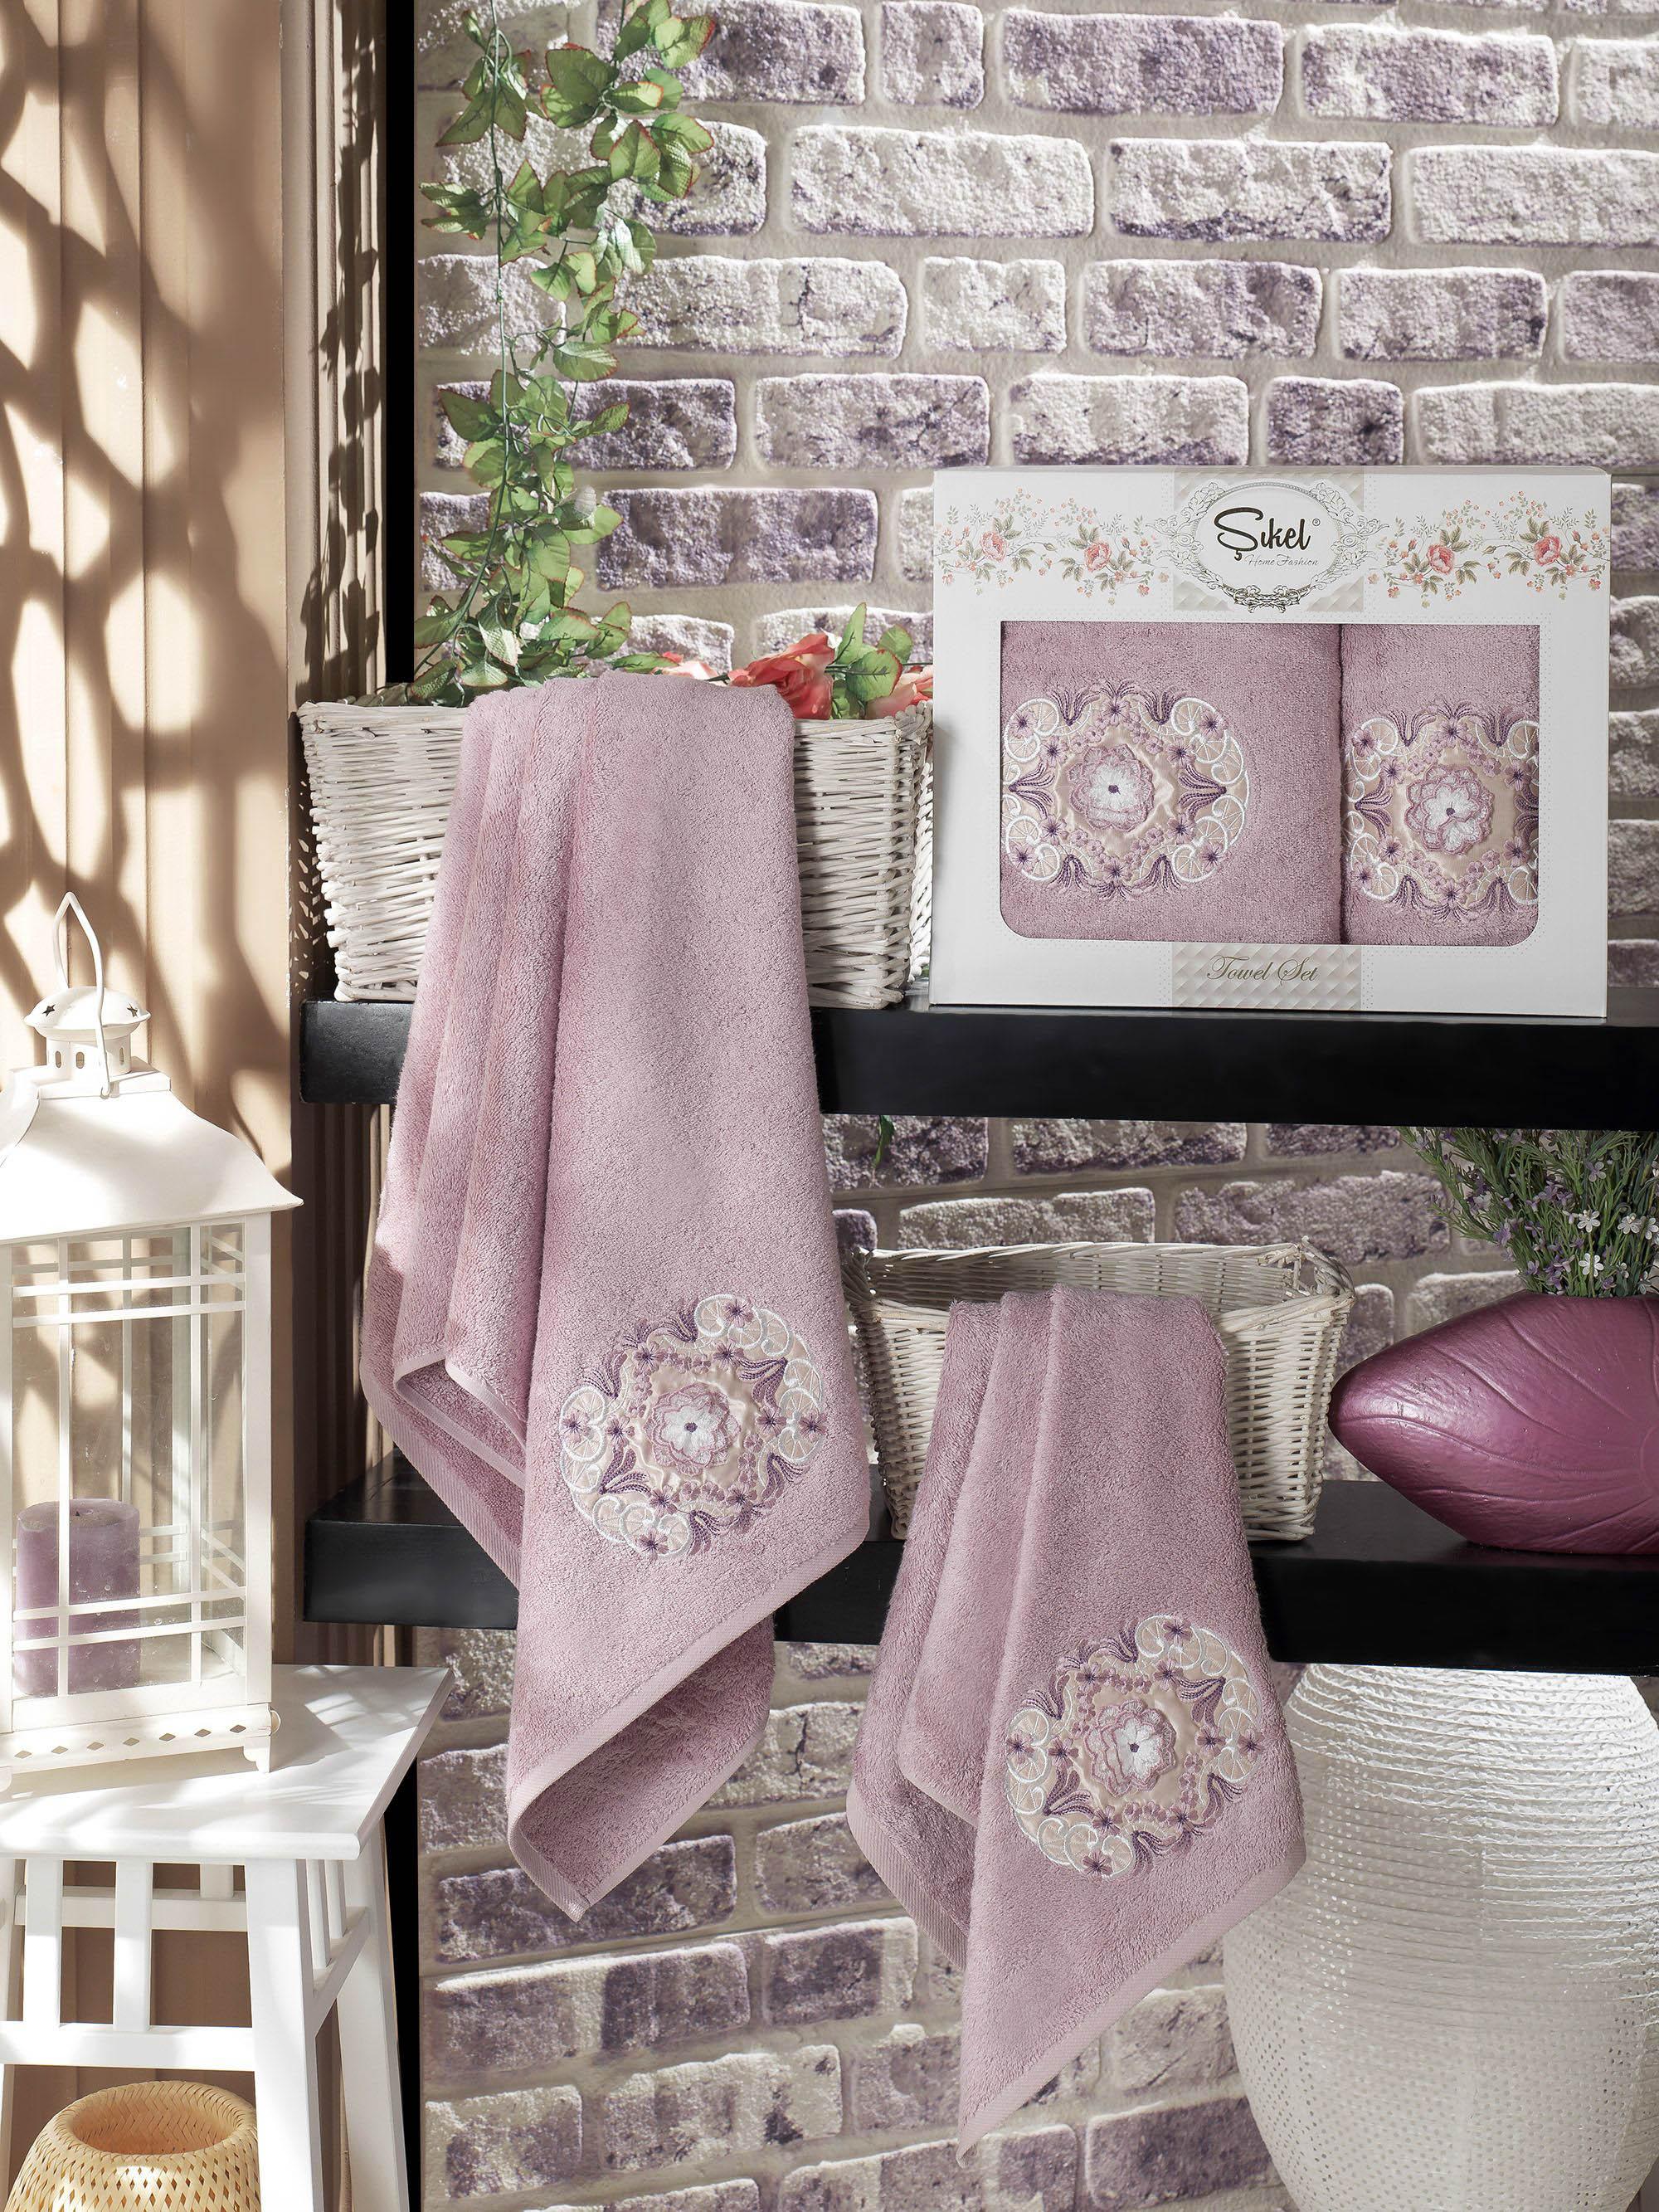 Полотенца Sikel Набор из 2 полотенец Kamelya Цвет: Лиловый набор из 2 полотенец merzuka sakura 50х90 70х140 8430 кремовый